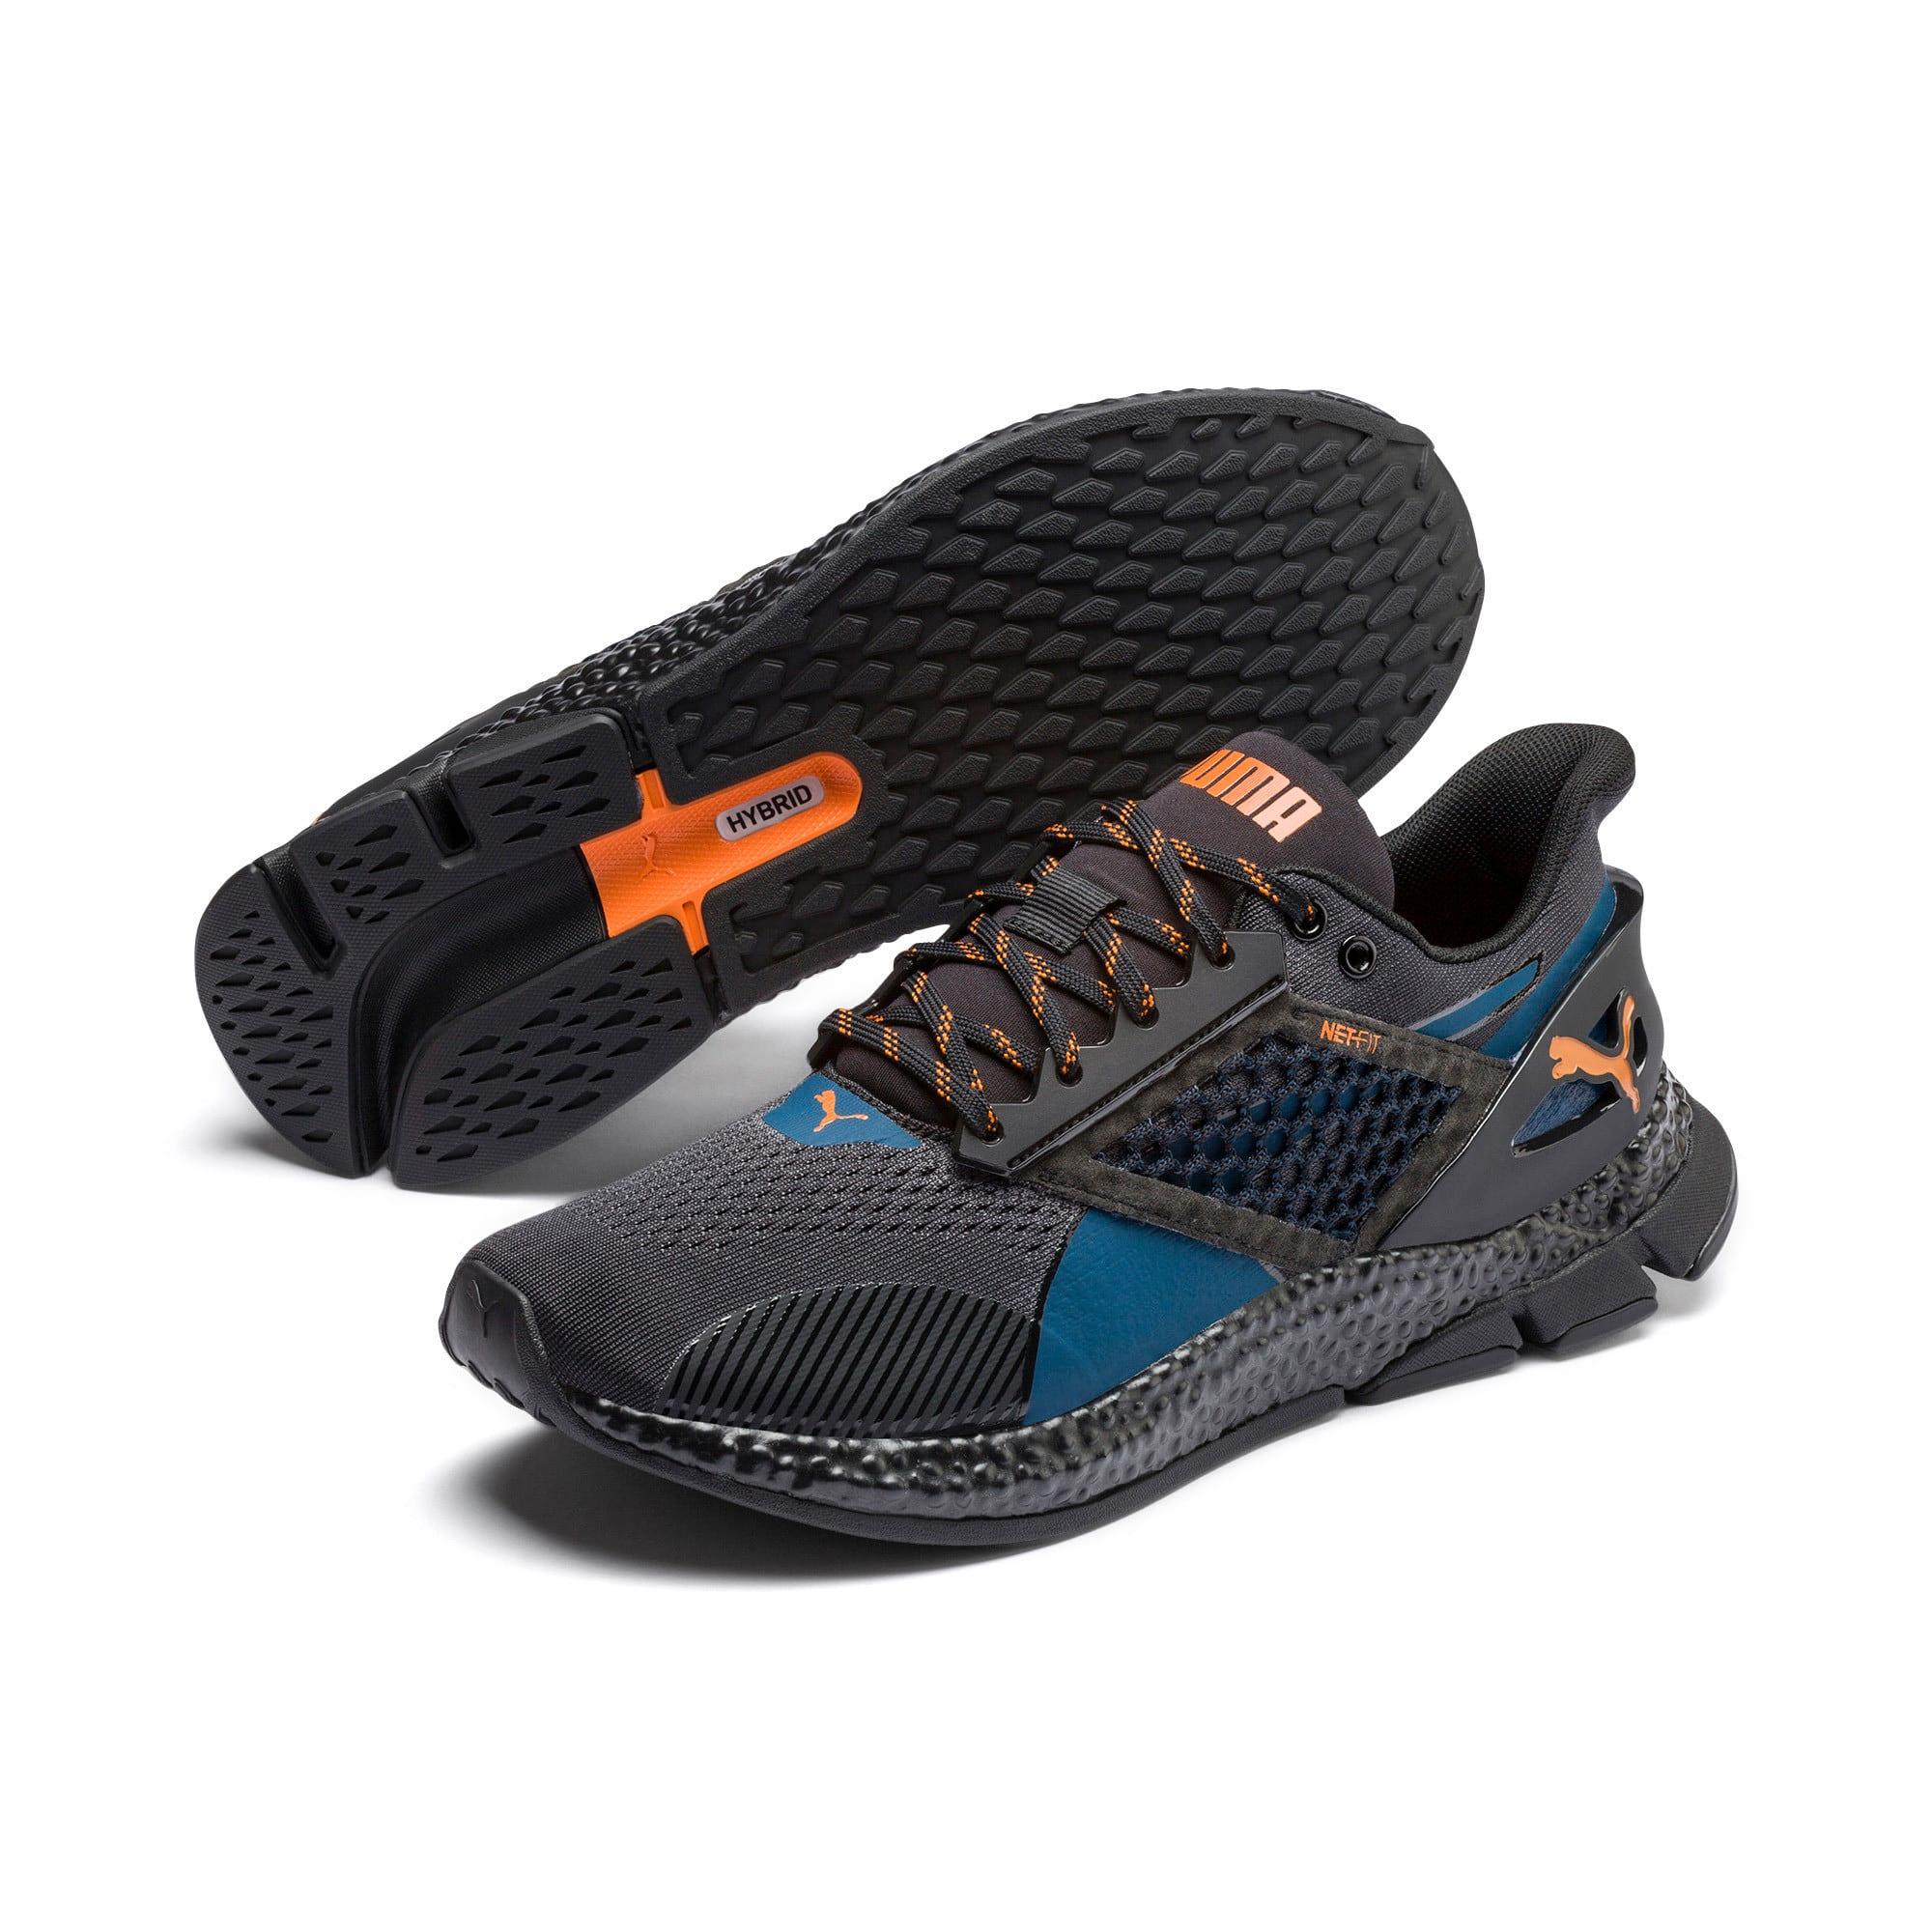 Imagen en miniatura 3 de Zapatillas de running de hombre HYBRID NETFIT Astro, Gibraltar Sea-Puma Black, mediana